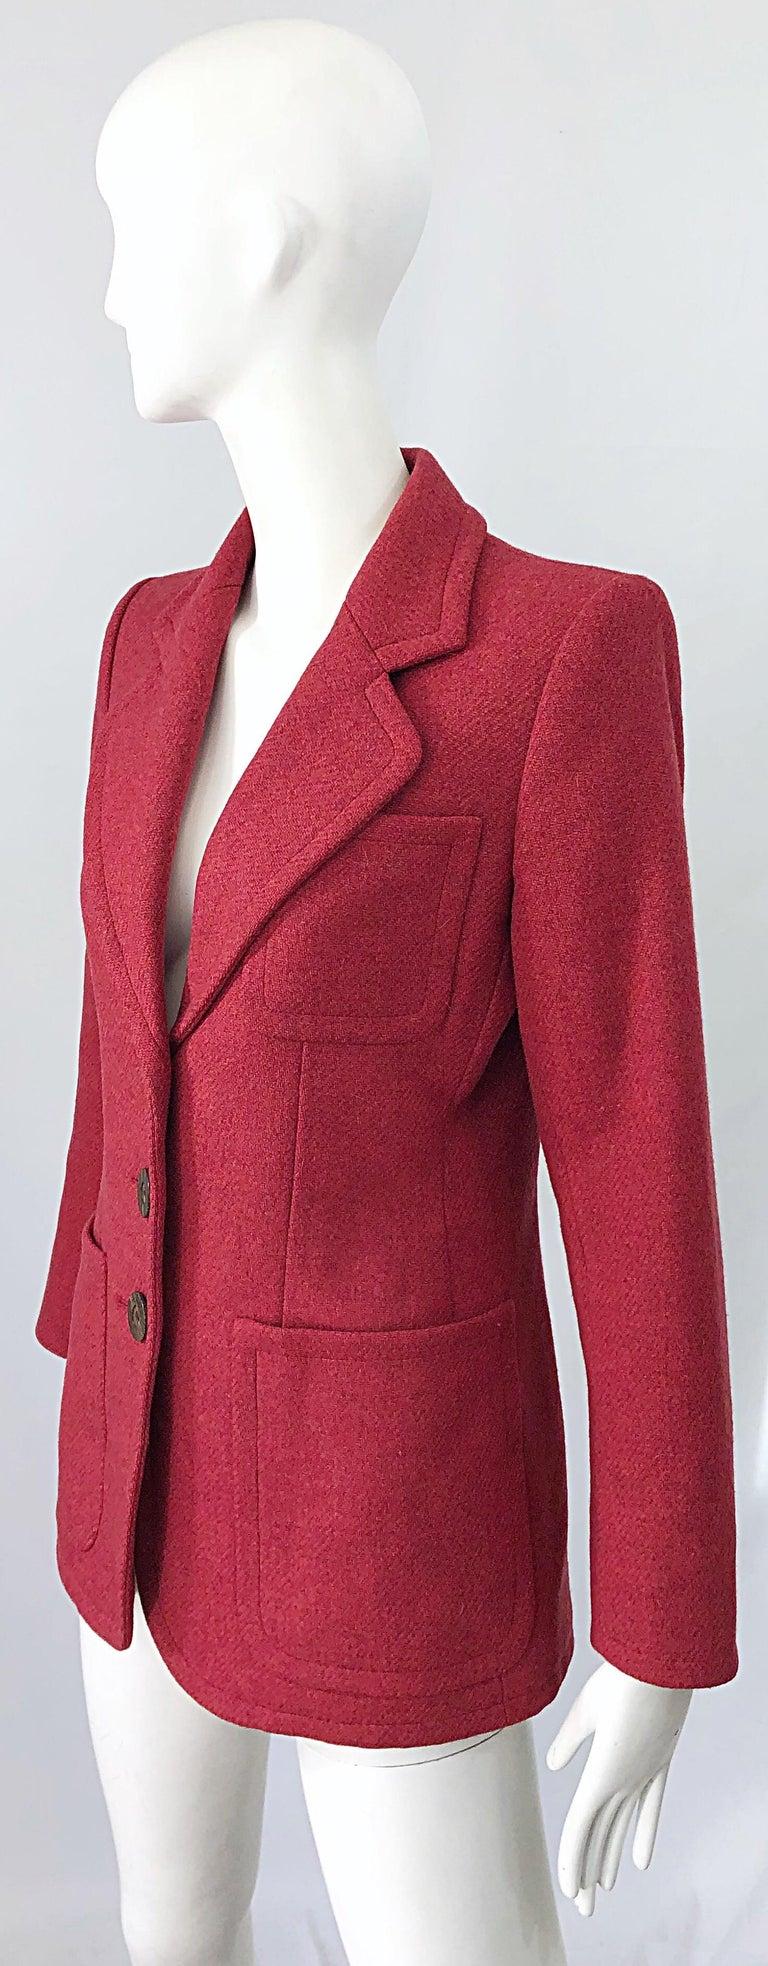 Vintage Yves Saint Laurent 1990s Raspberry Pink Classic 90s Blazer Jacket YSL For Sale 2